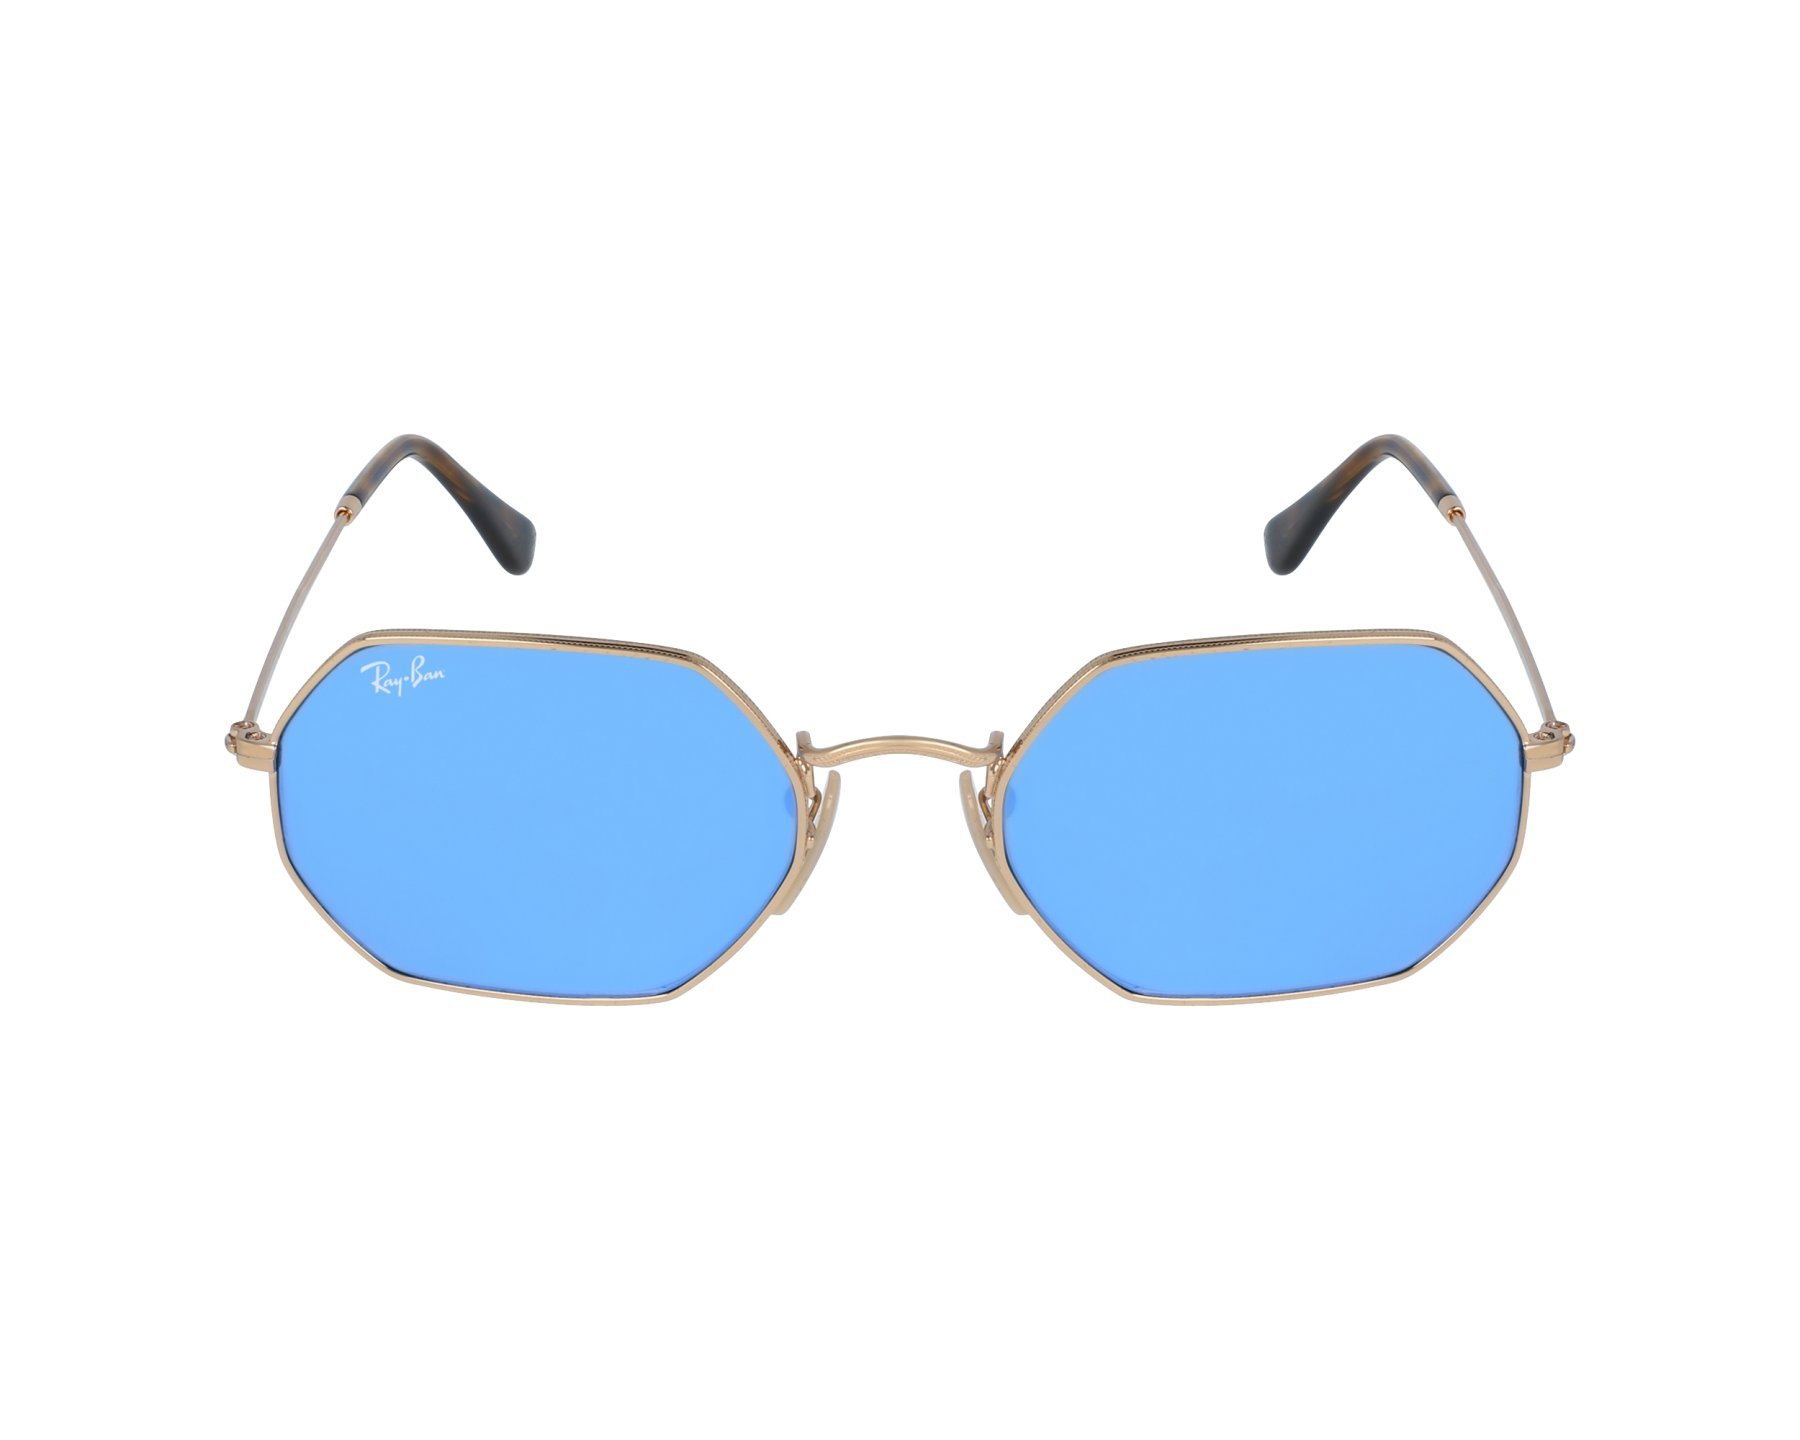 aa2bf3a3a61 thumbnail Sunglasses Ray-Ban RB-3556 001 9O - Gold profile view